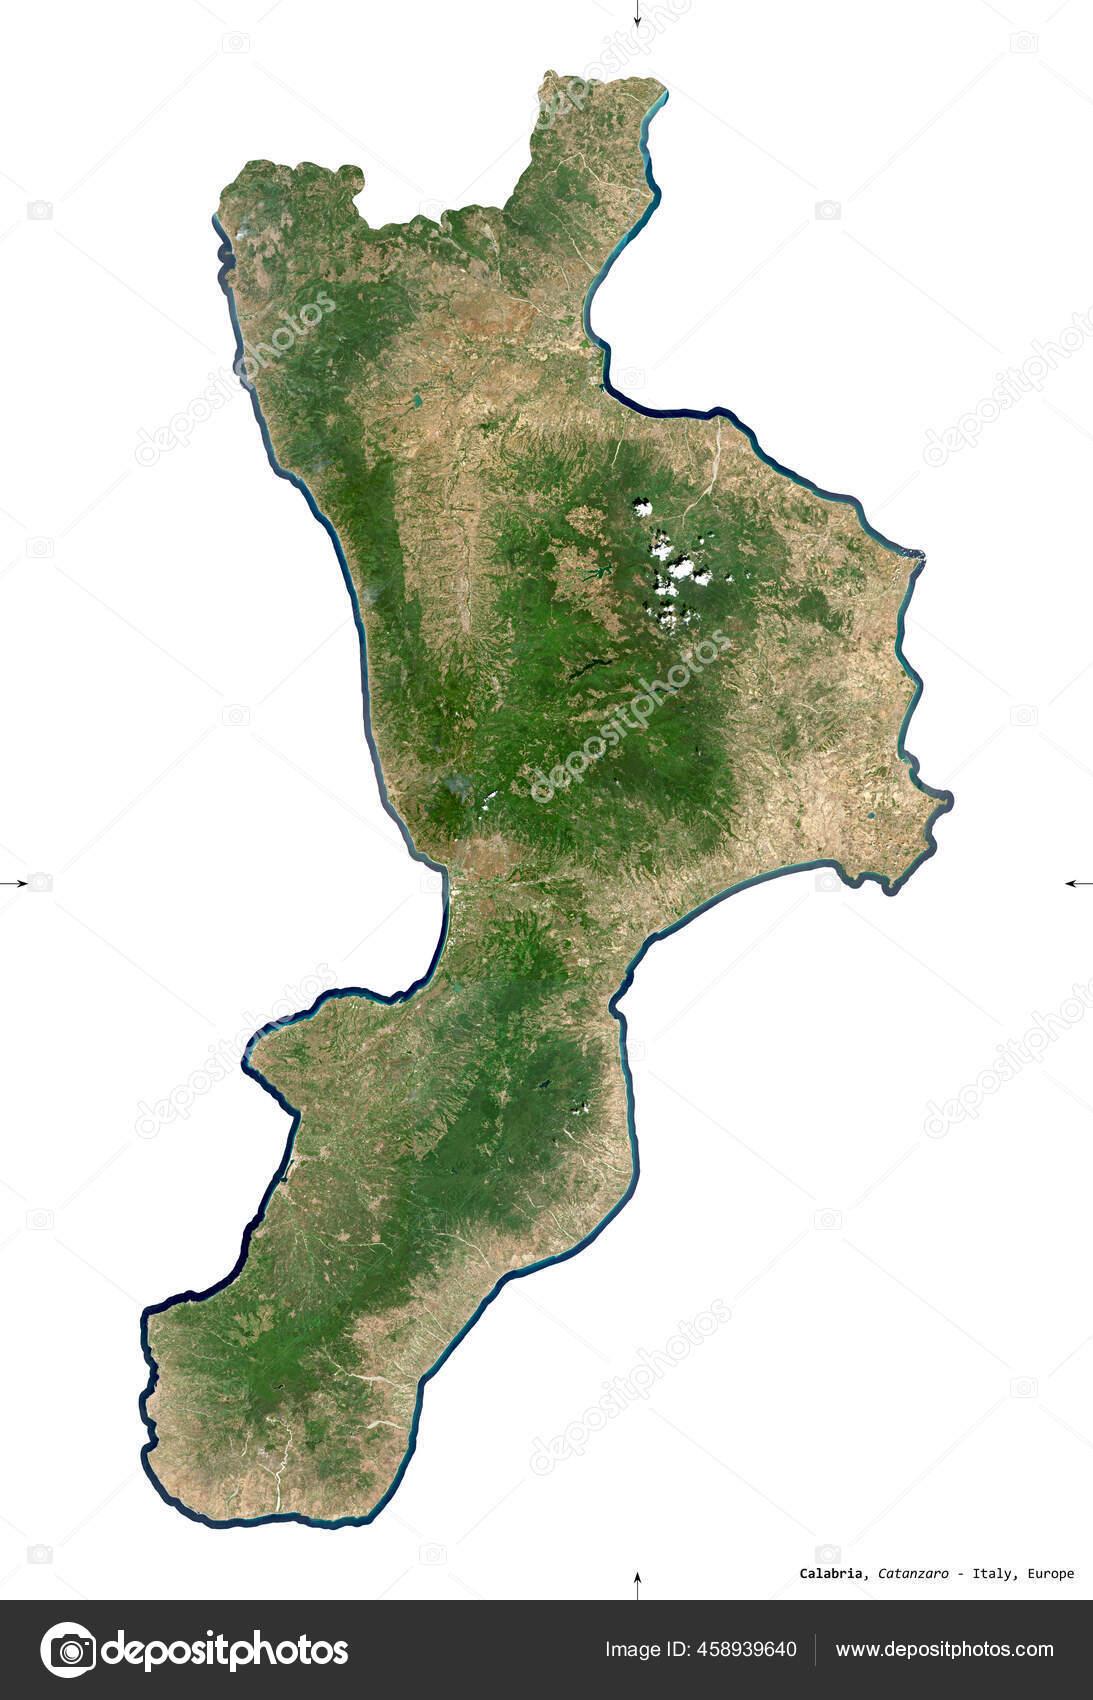 Cartina Geografica Calabria.Foto Cartina Della Calabria Immagini Cartina Della Calabria Da Scaricare Foto Stock Depositphotos